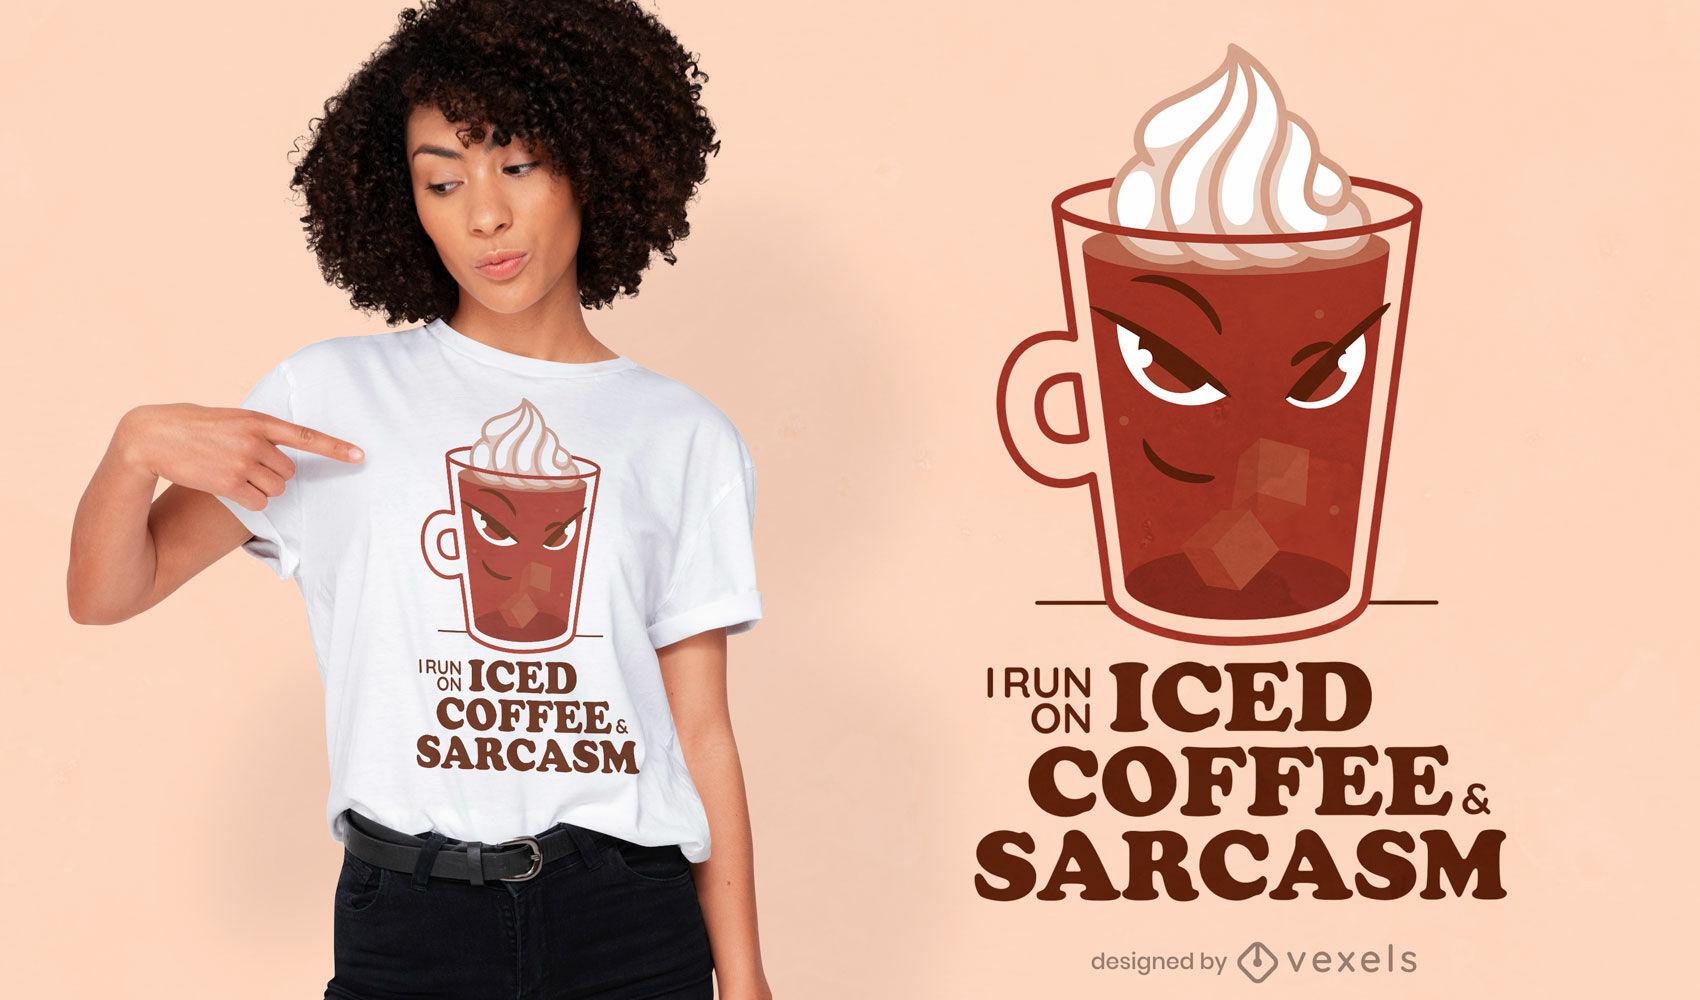 Iced coffee & sarcasm t-shirt design